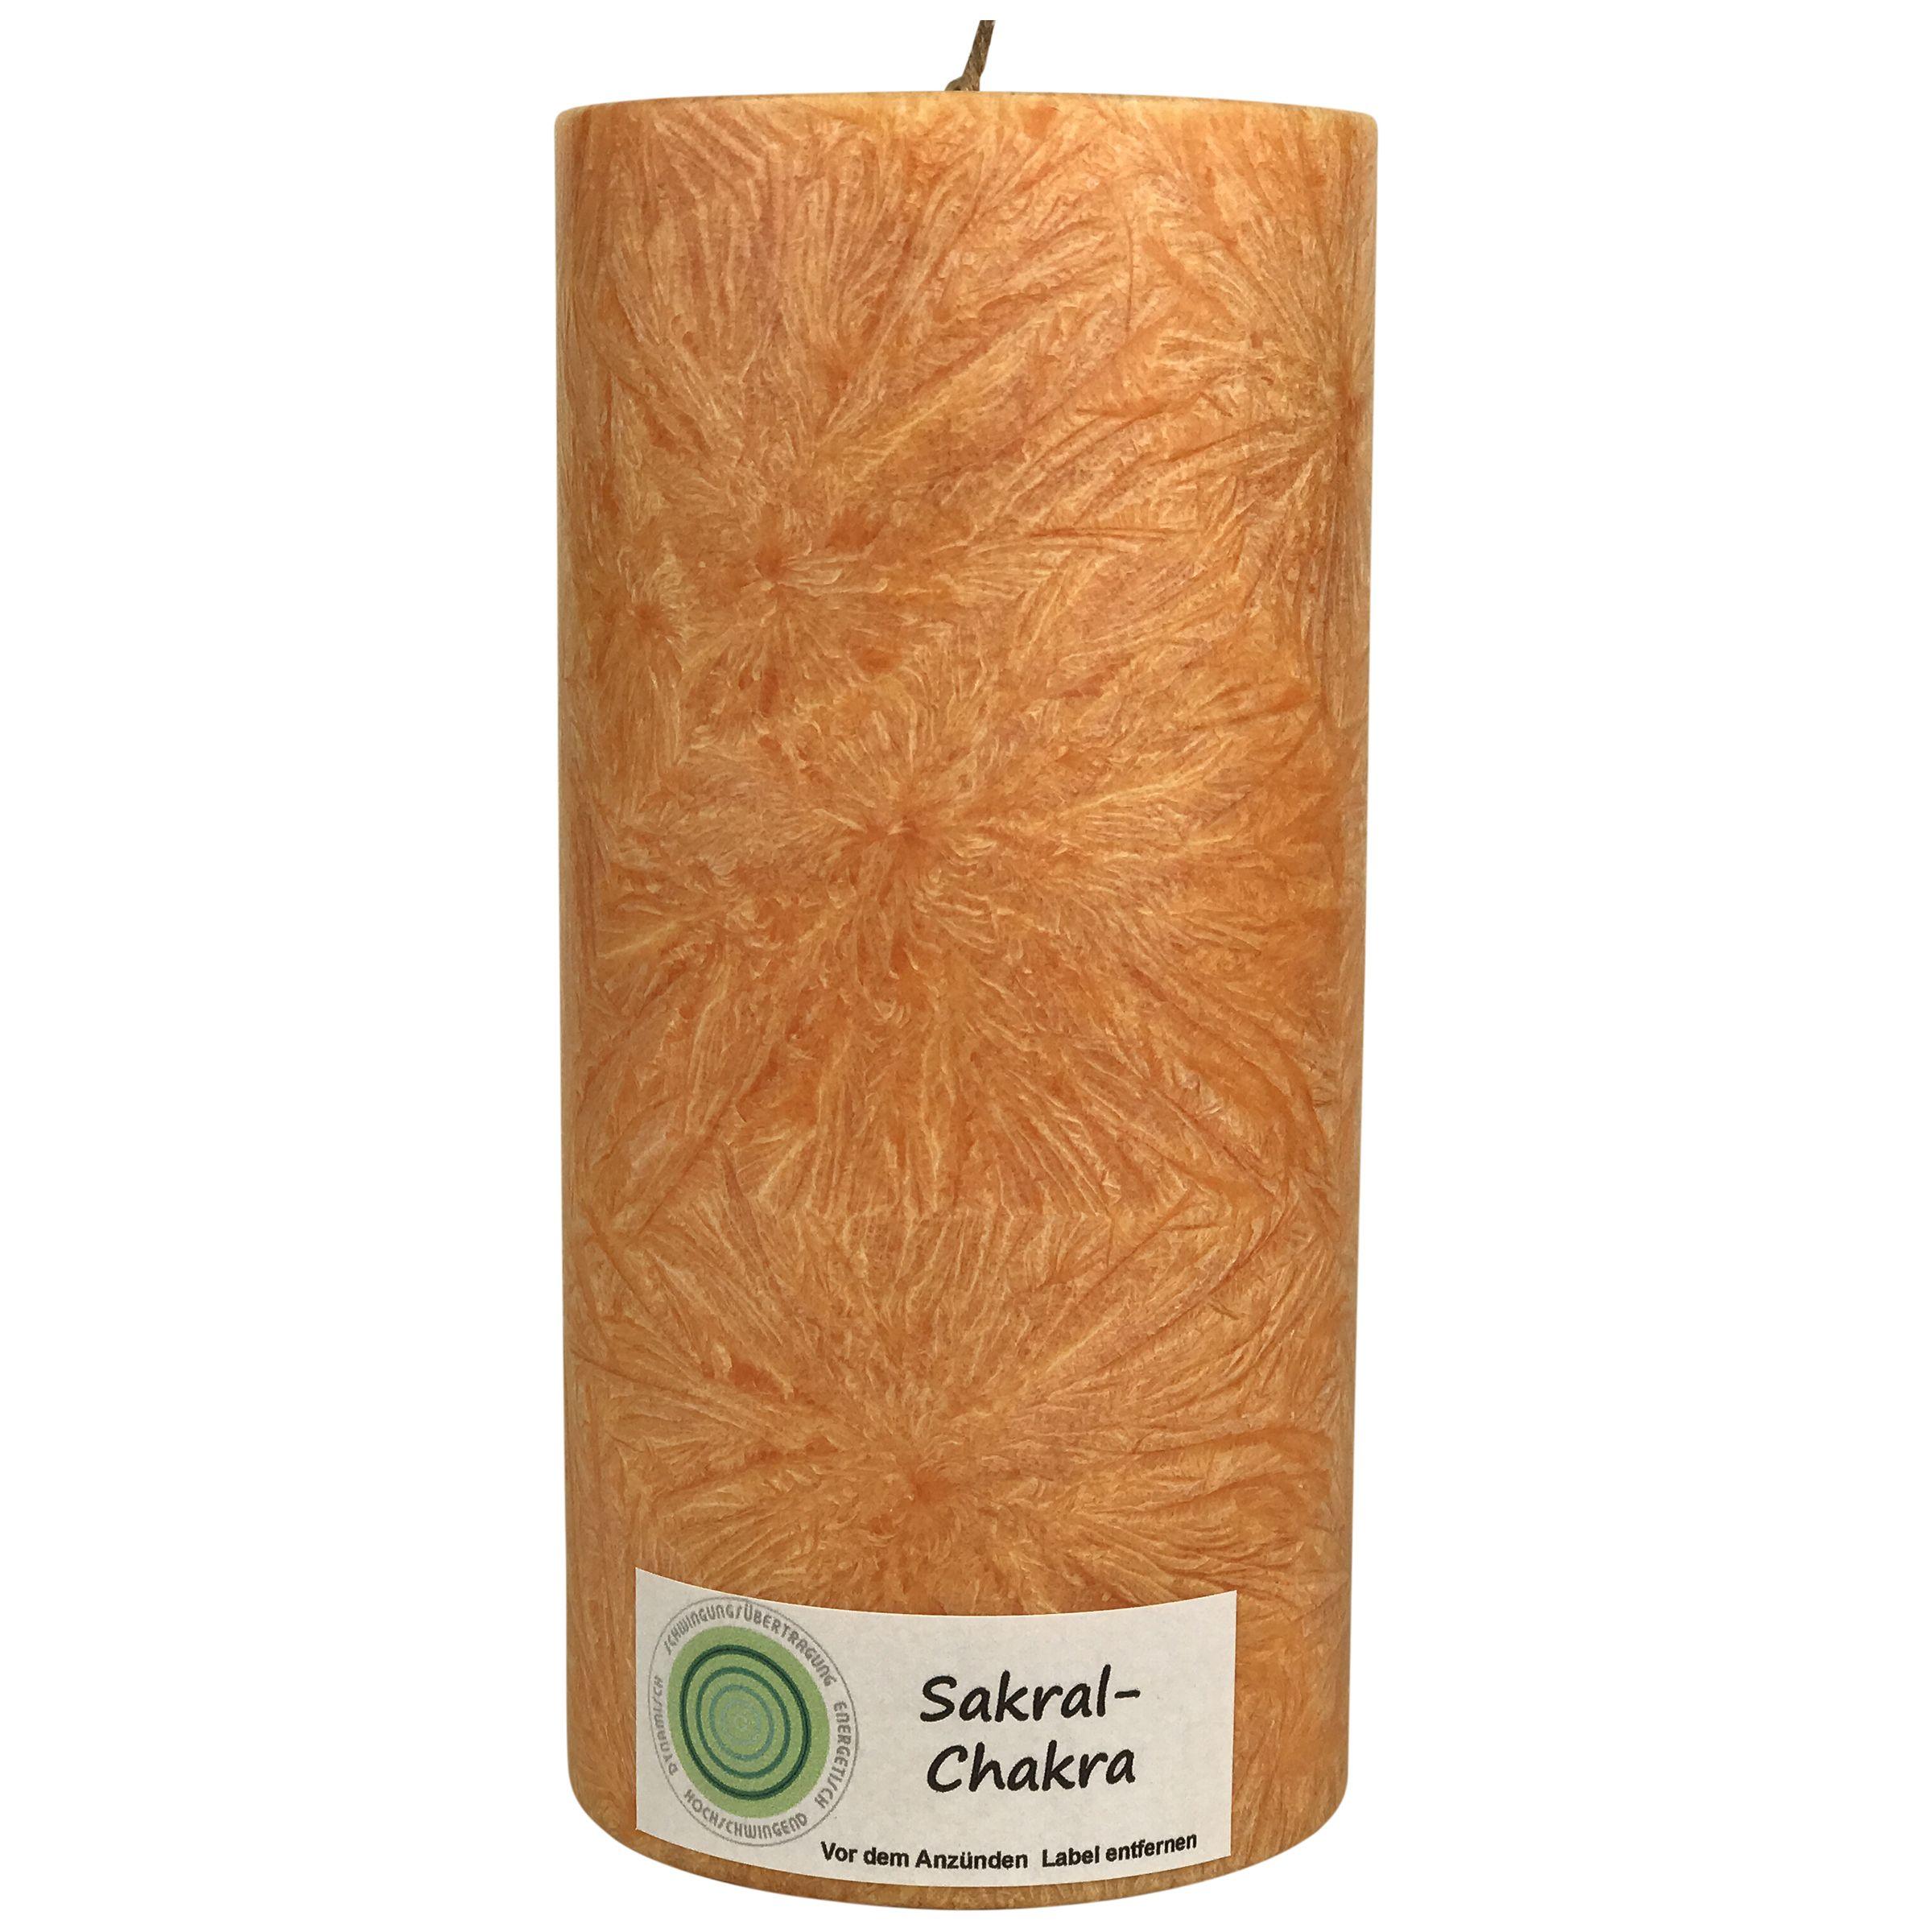 Sakral Chakra Kerze Chakra Kerzen Und Stumpenkerzen